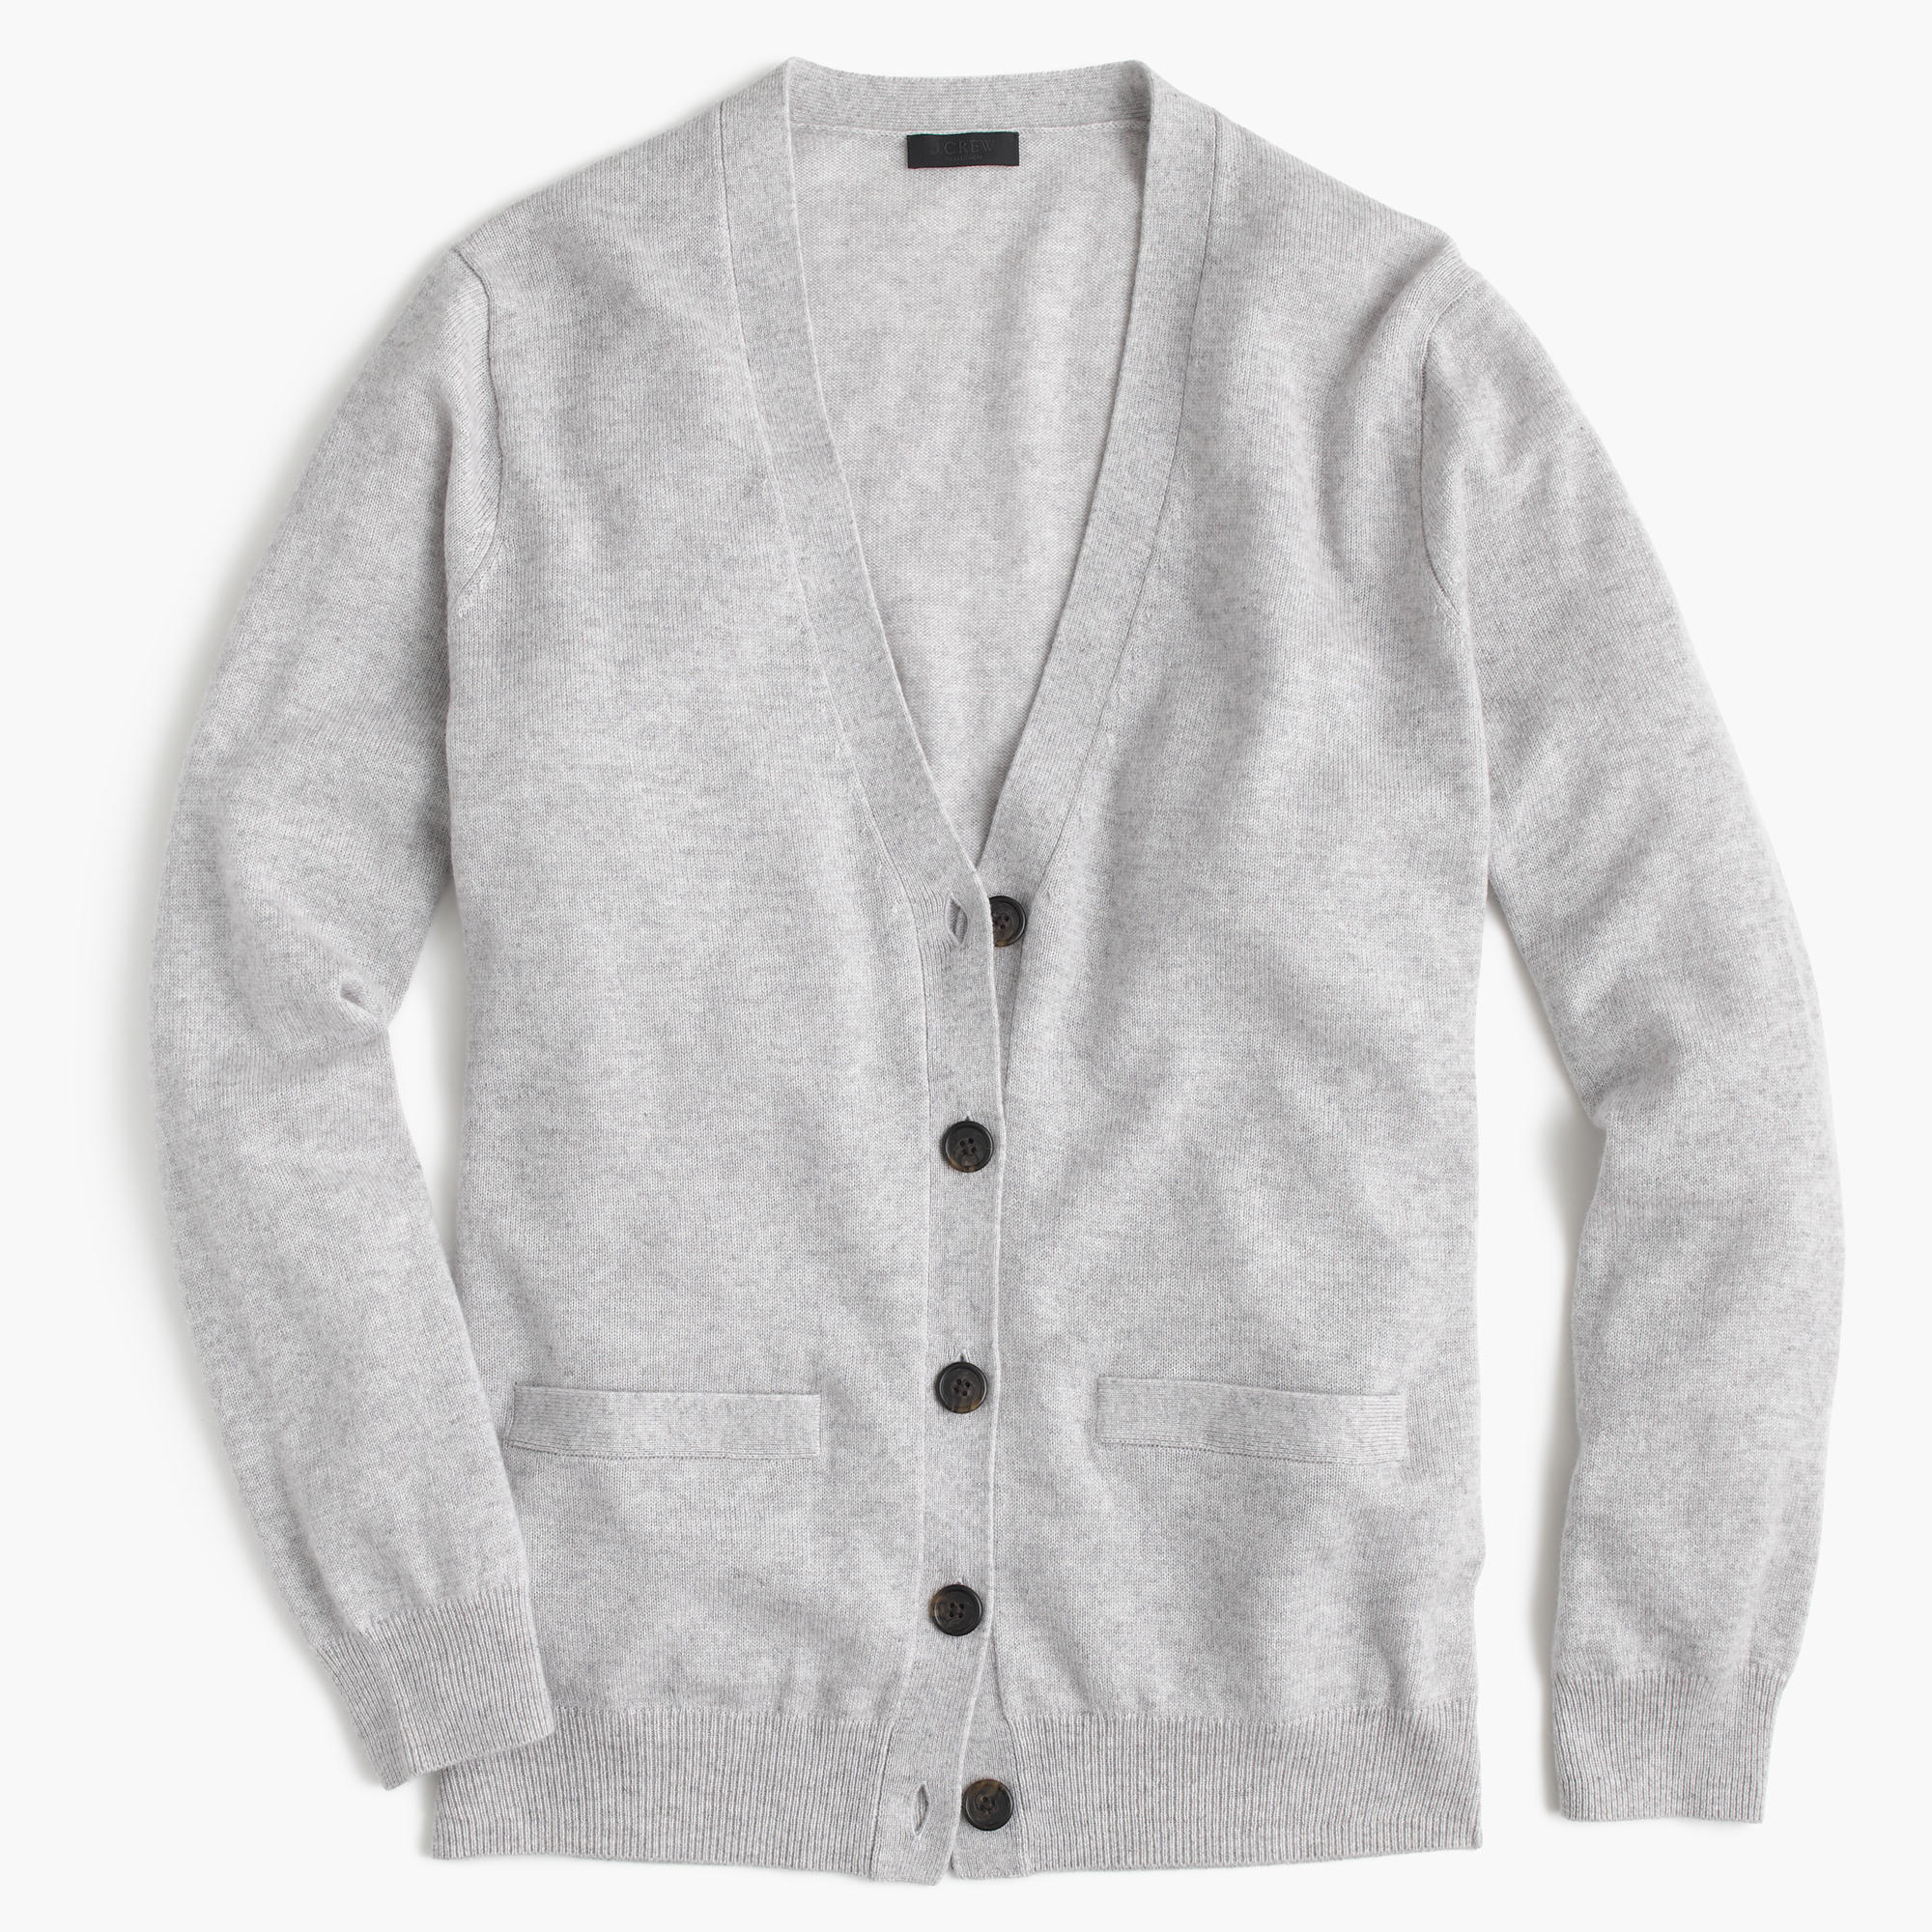 J.crew Italian Cashmere Boyfriend Cardigan Sweater in Metallic | Lyst